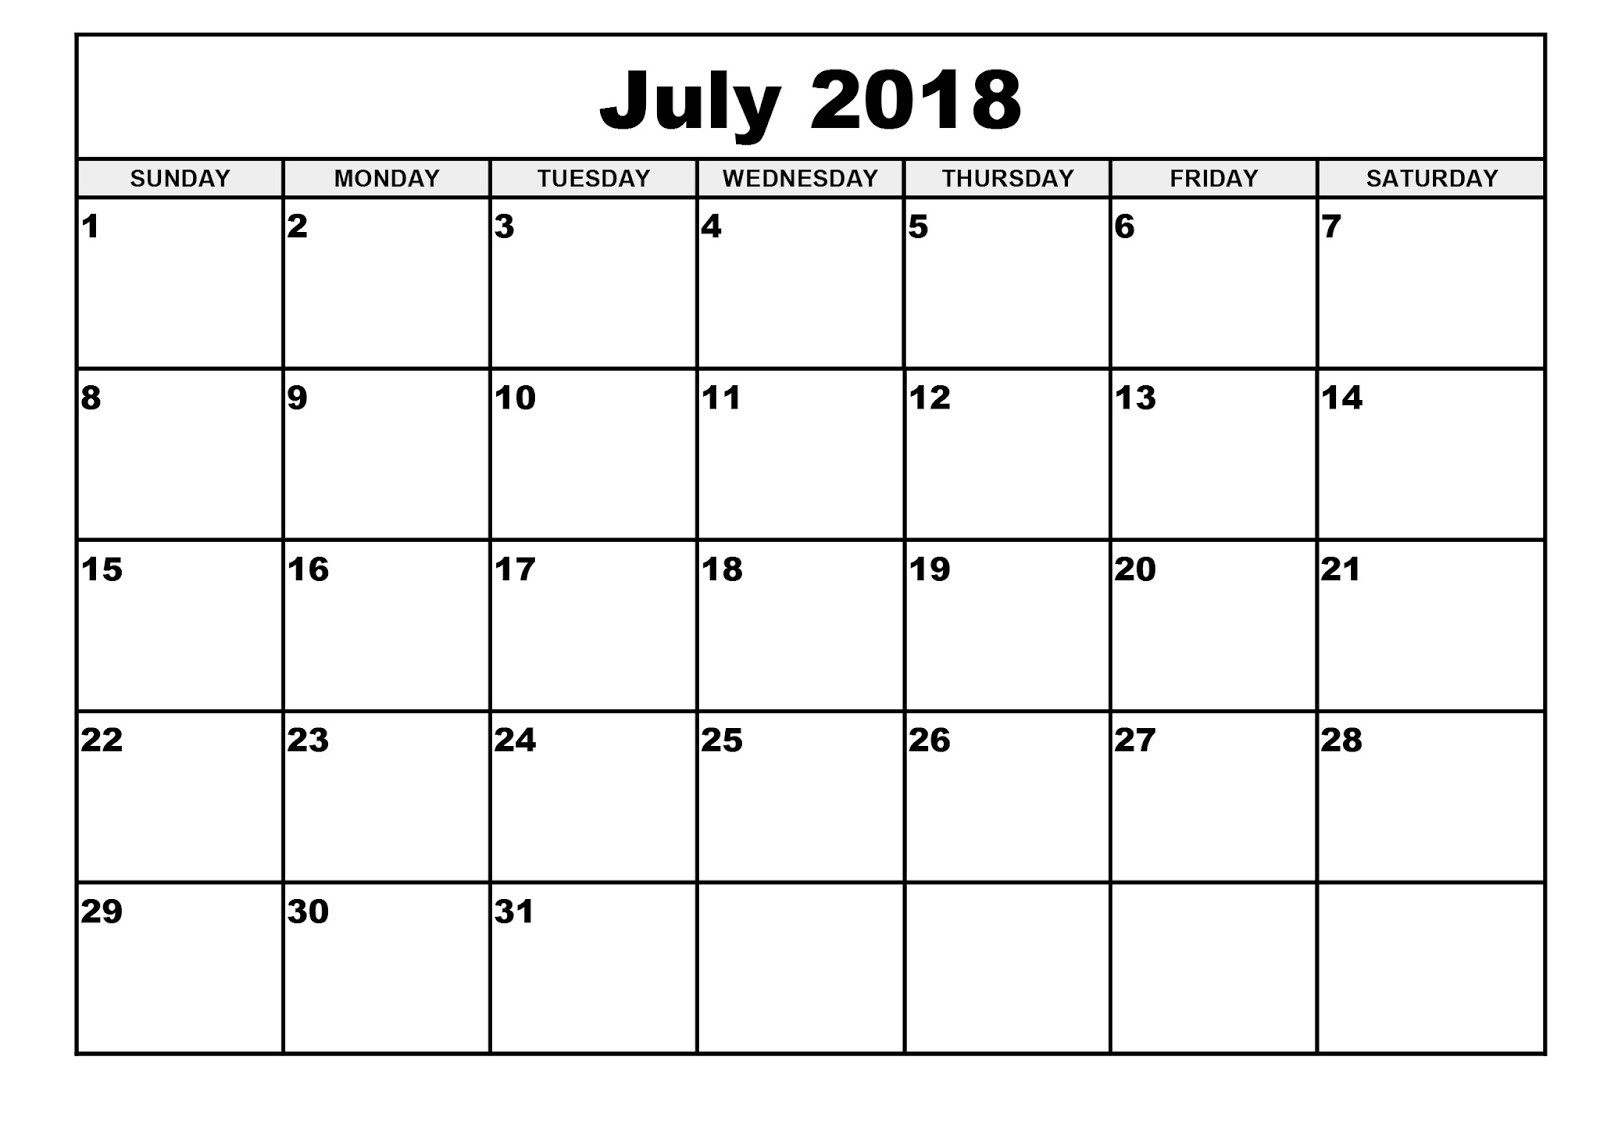 Free July 2018 Calendar Printable Blank Templates - Word Pdf with July Calendar Printable Template